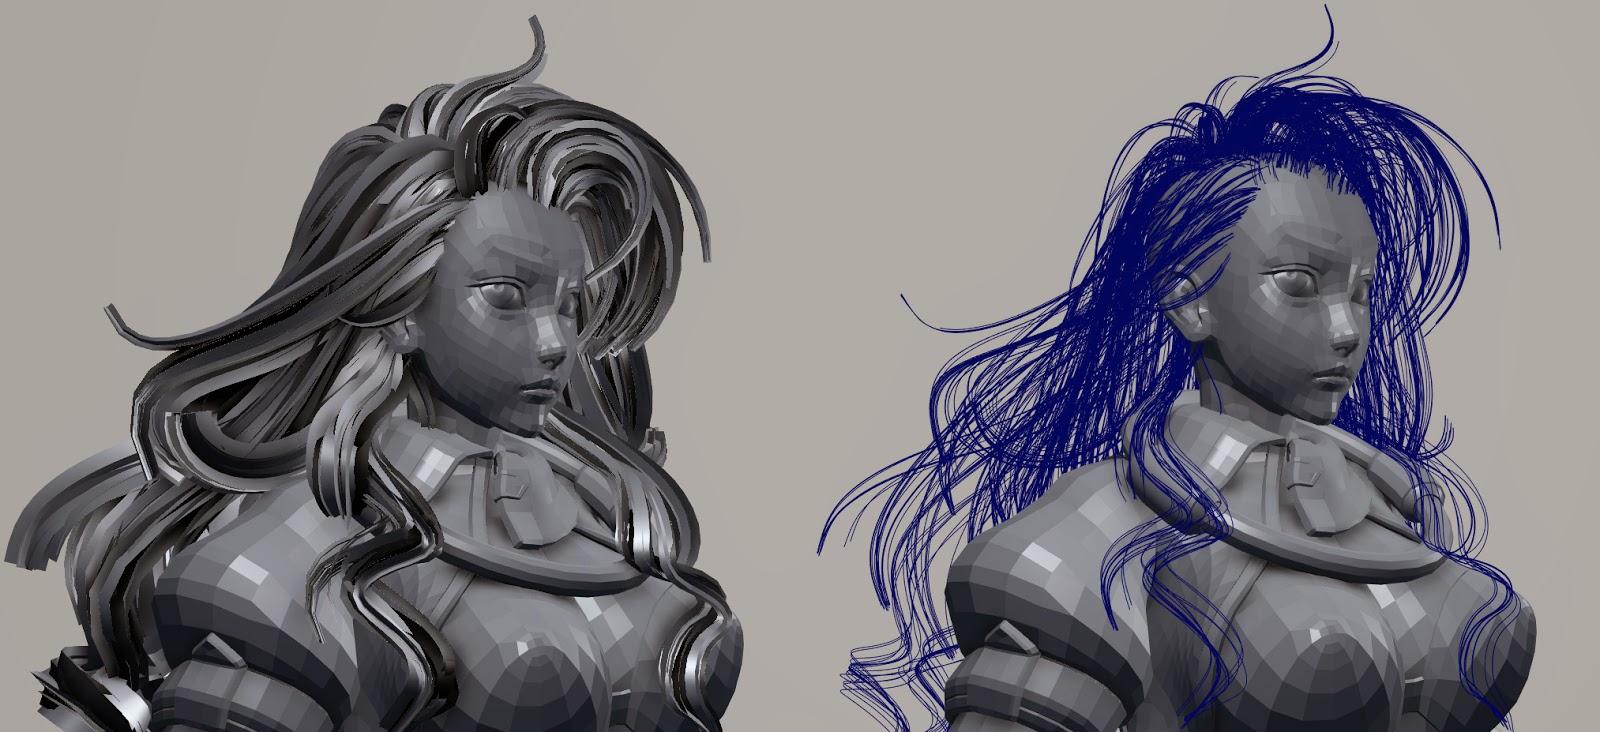 New Plugin Maya Hair Tool GMH V26 For Autodesk Maya Sneak Peek